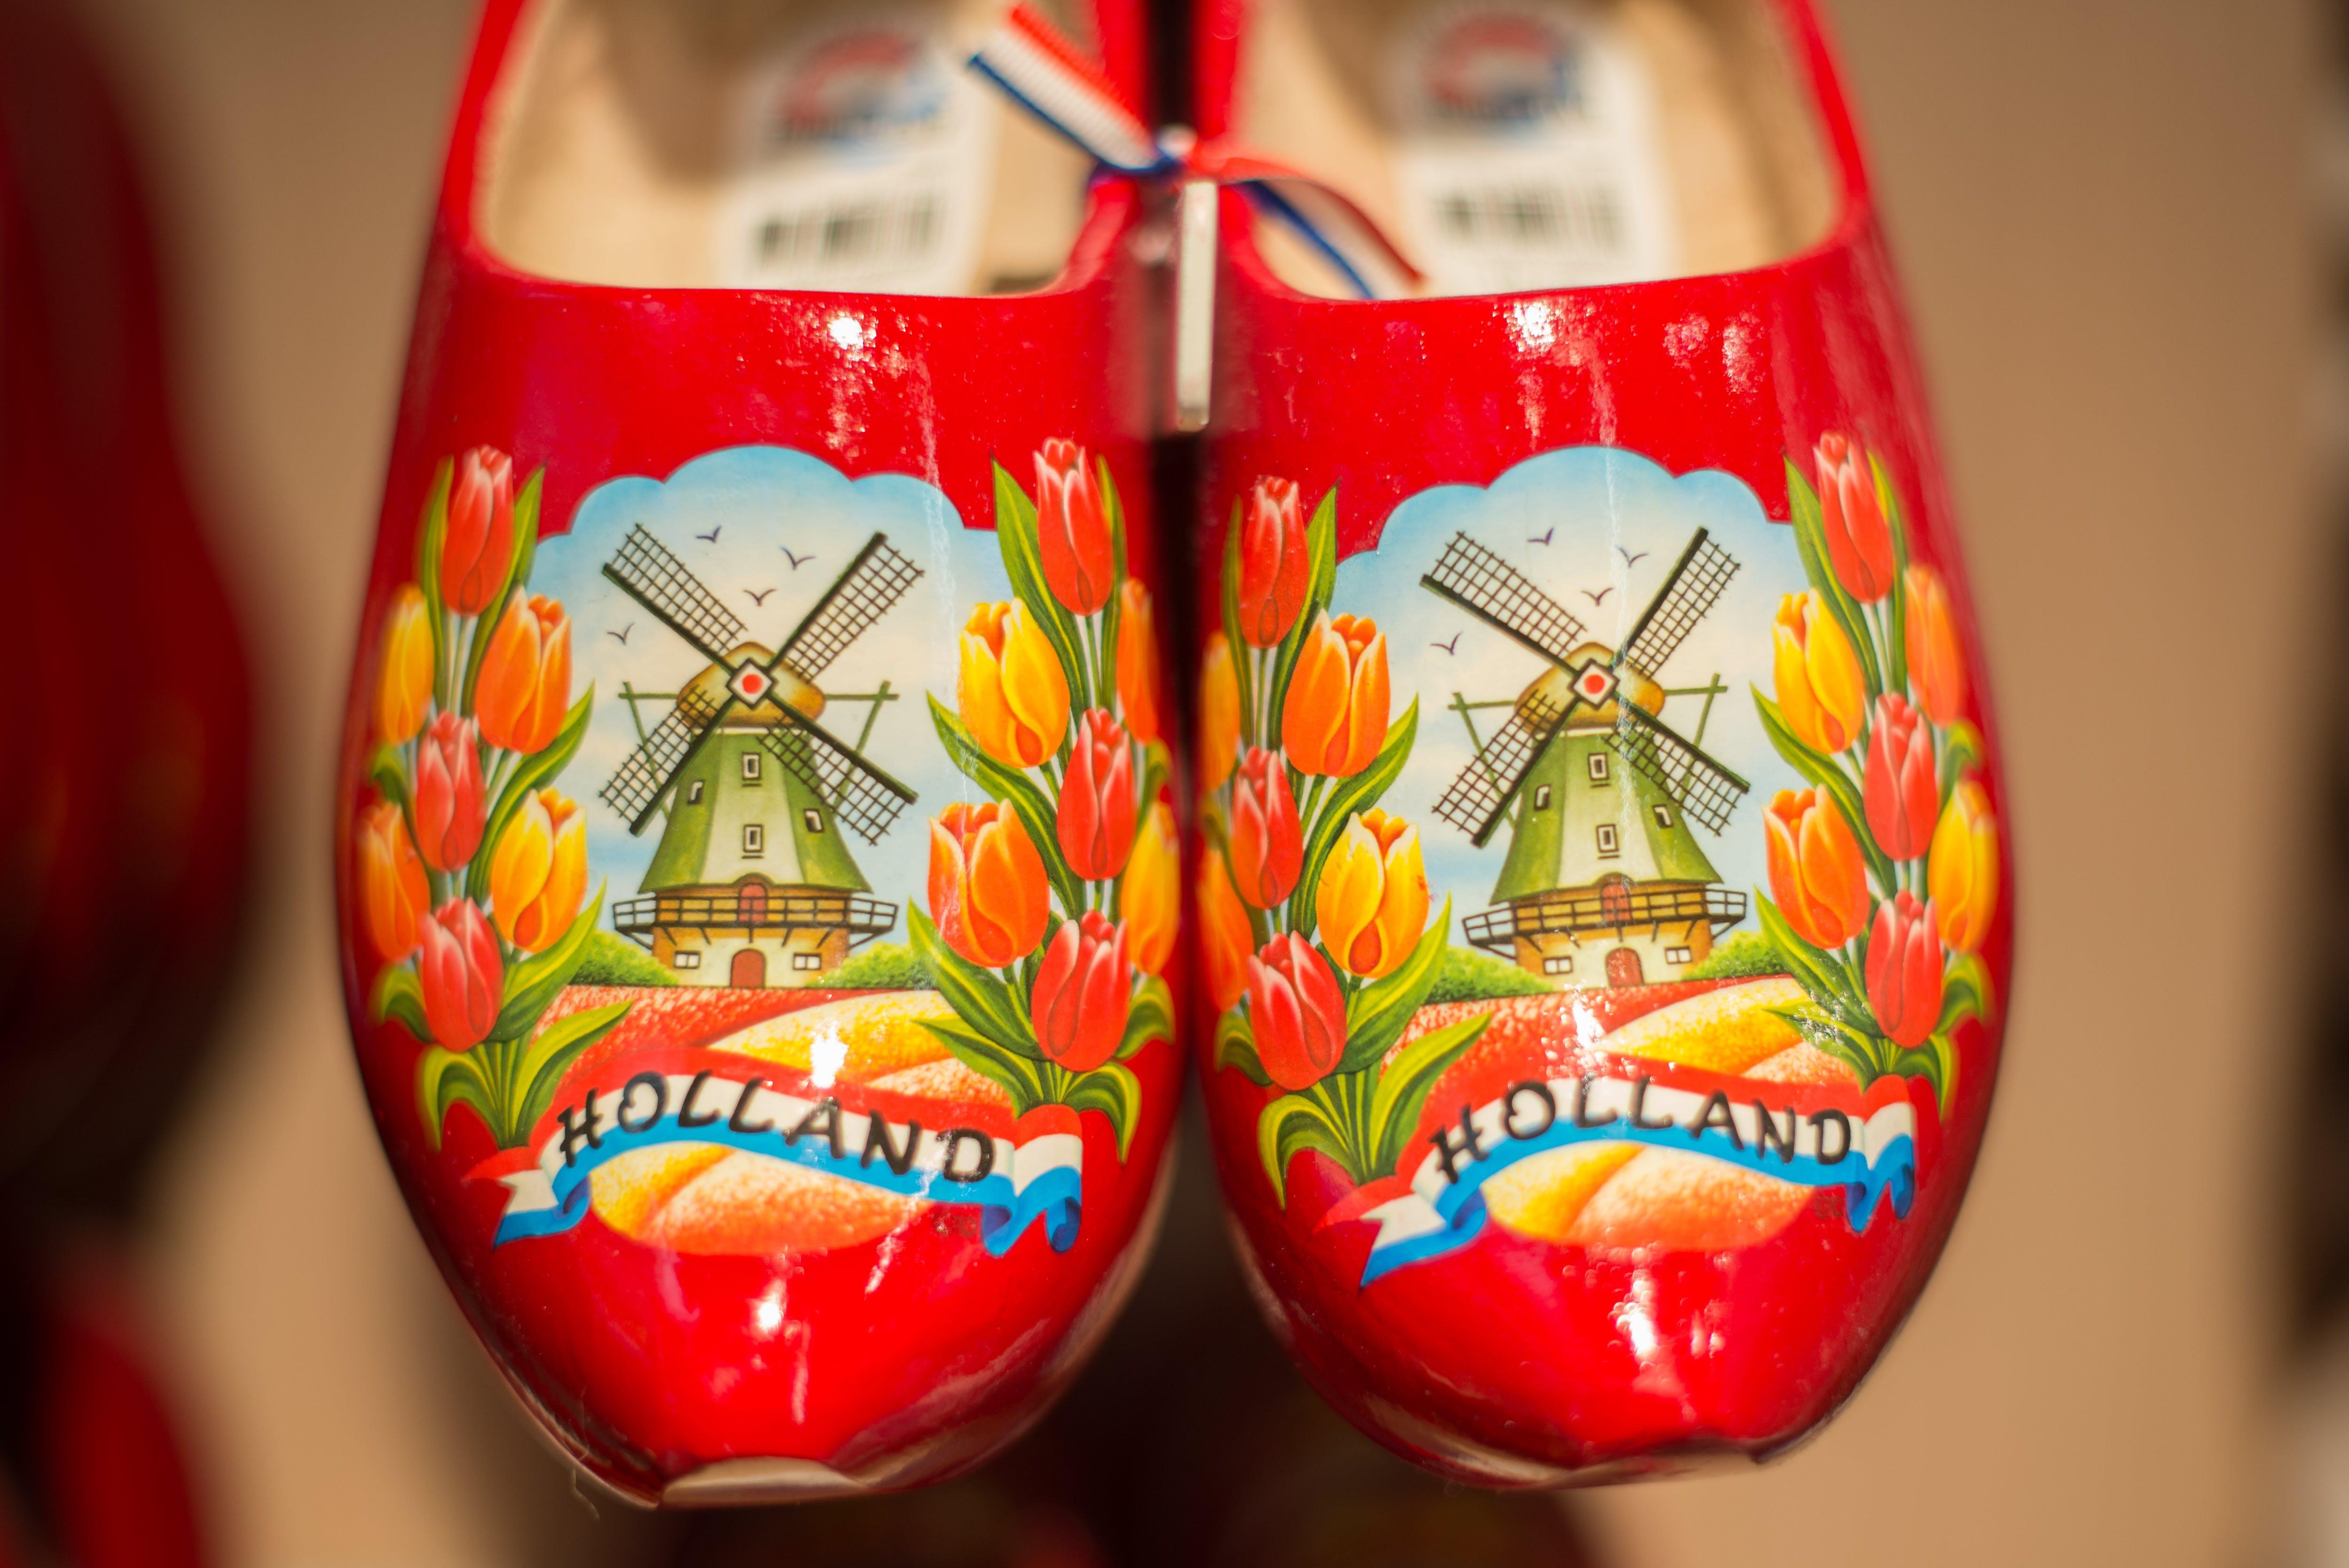 Pair of Red Ceramic Shoes